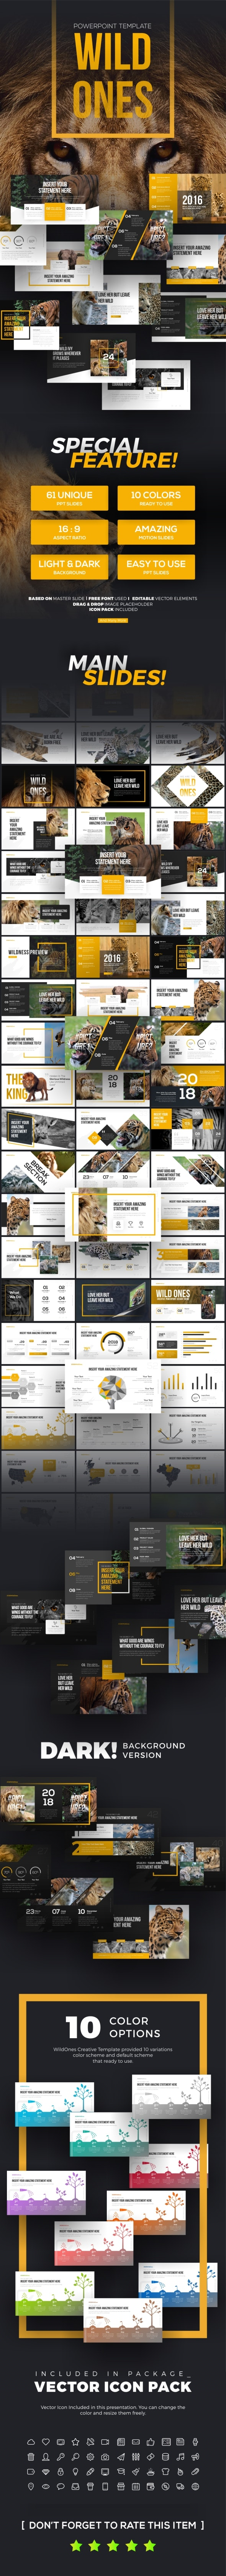 Wildones Nature & Wildlife PowerPoint Template - PowerPoint Templates Presentation Templates